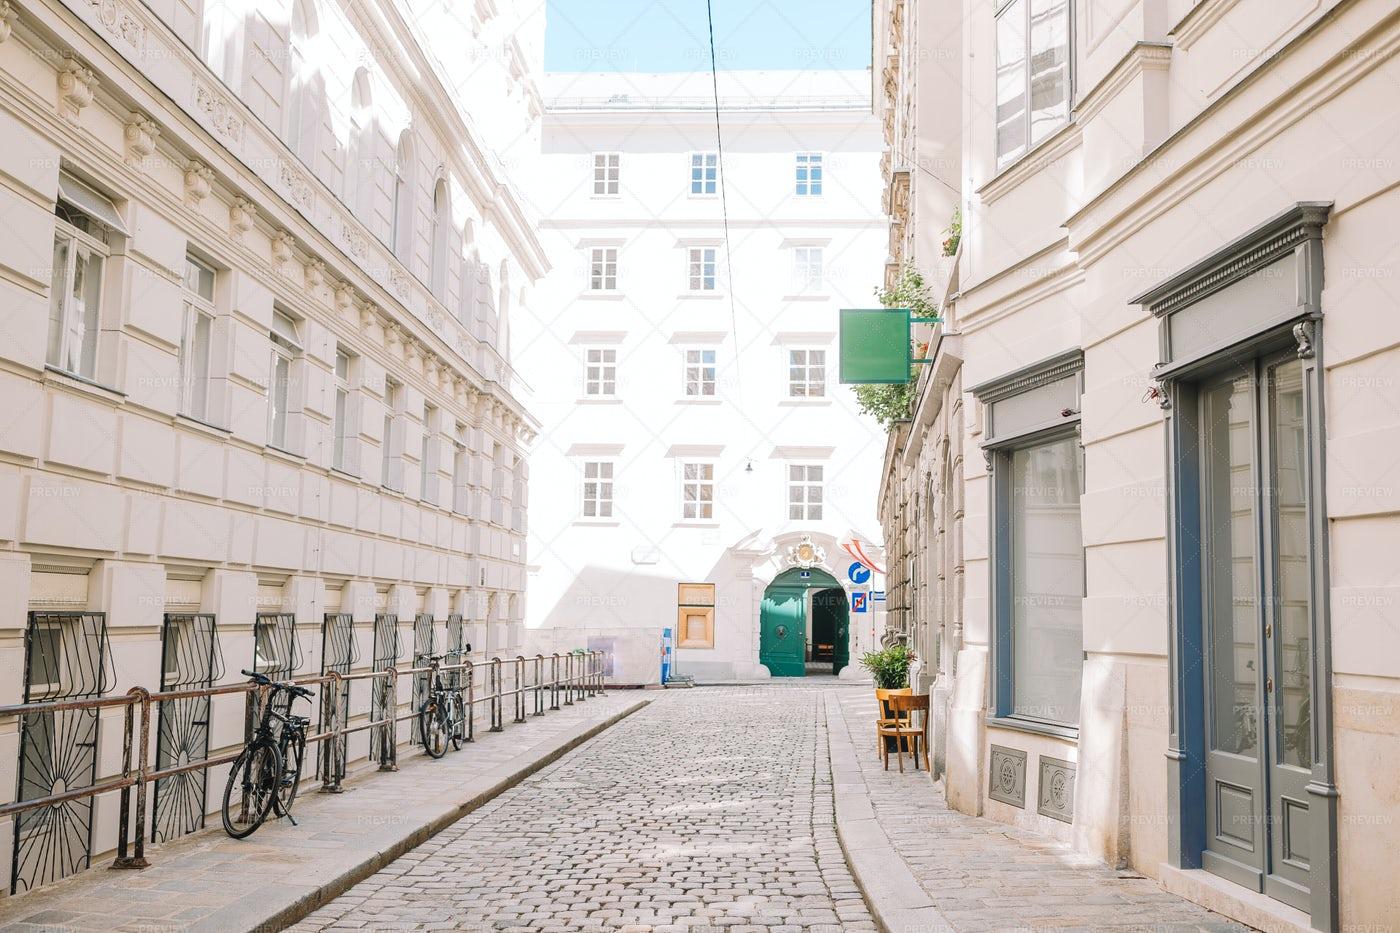 Empty Street In Vienna: Stock Photos